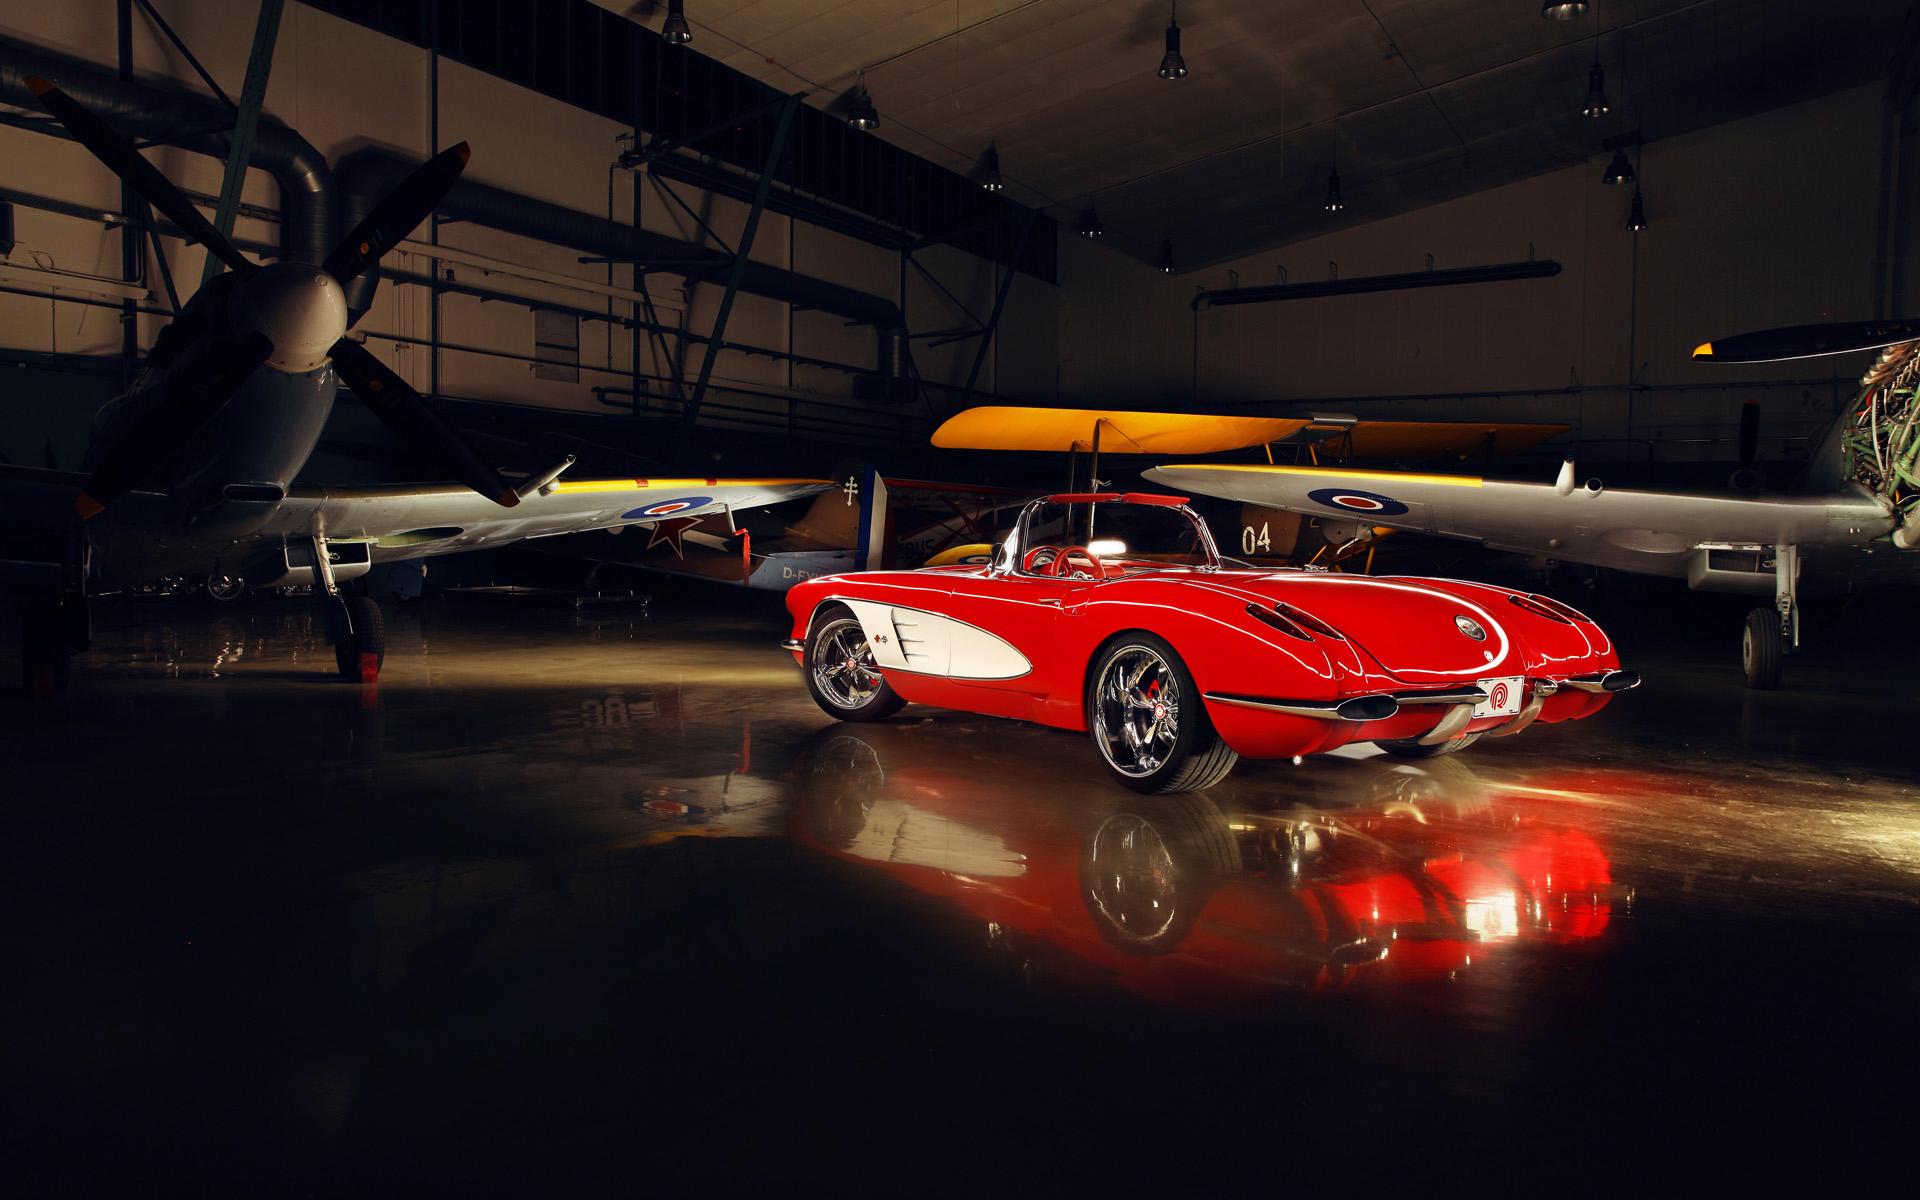 Wallpaper Airplane Red Cars Sports Car Corvette Performance